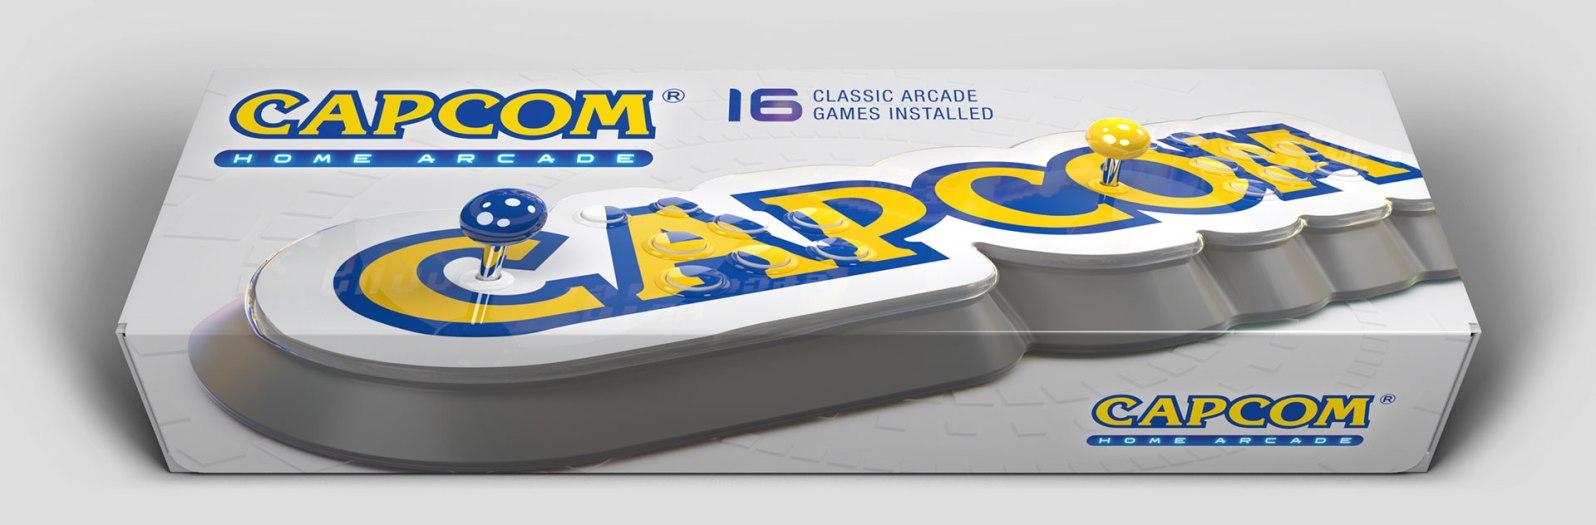 Quelle: Koch Media - Capcom Home Arcade - Verpackung